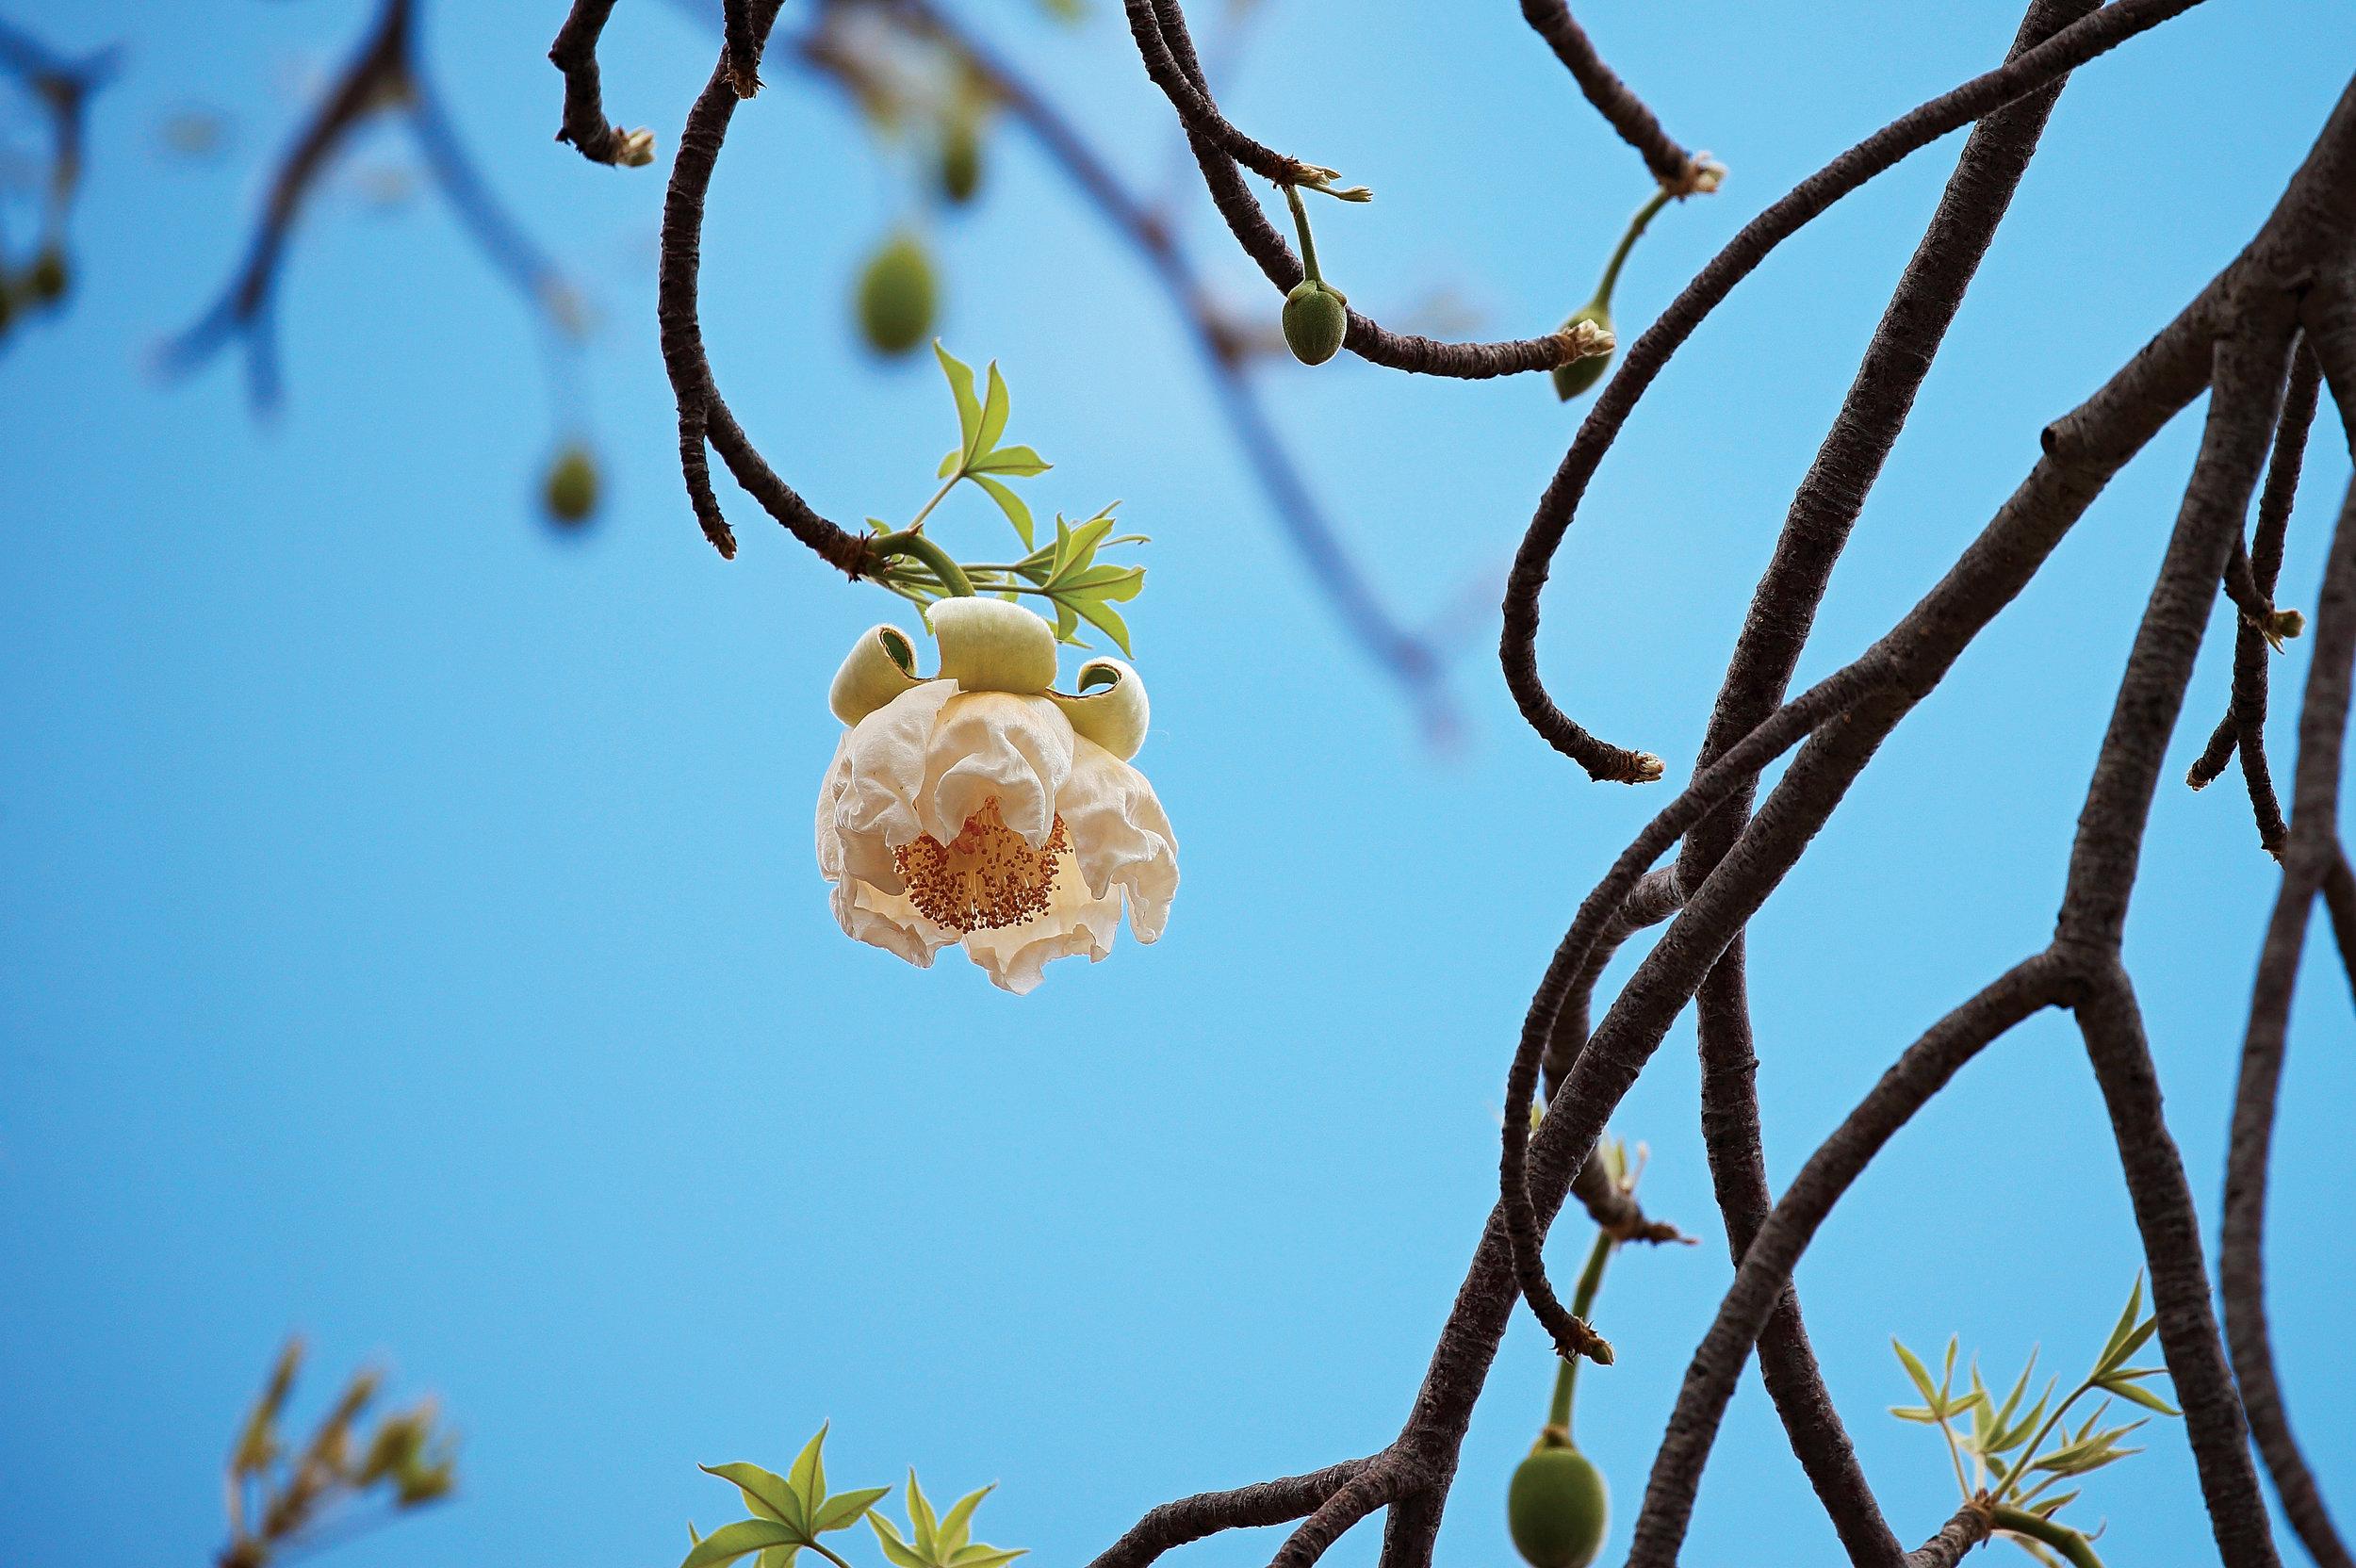 outpost_baobab1.jpg